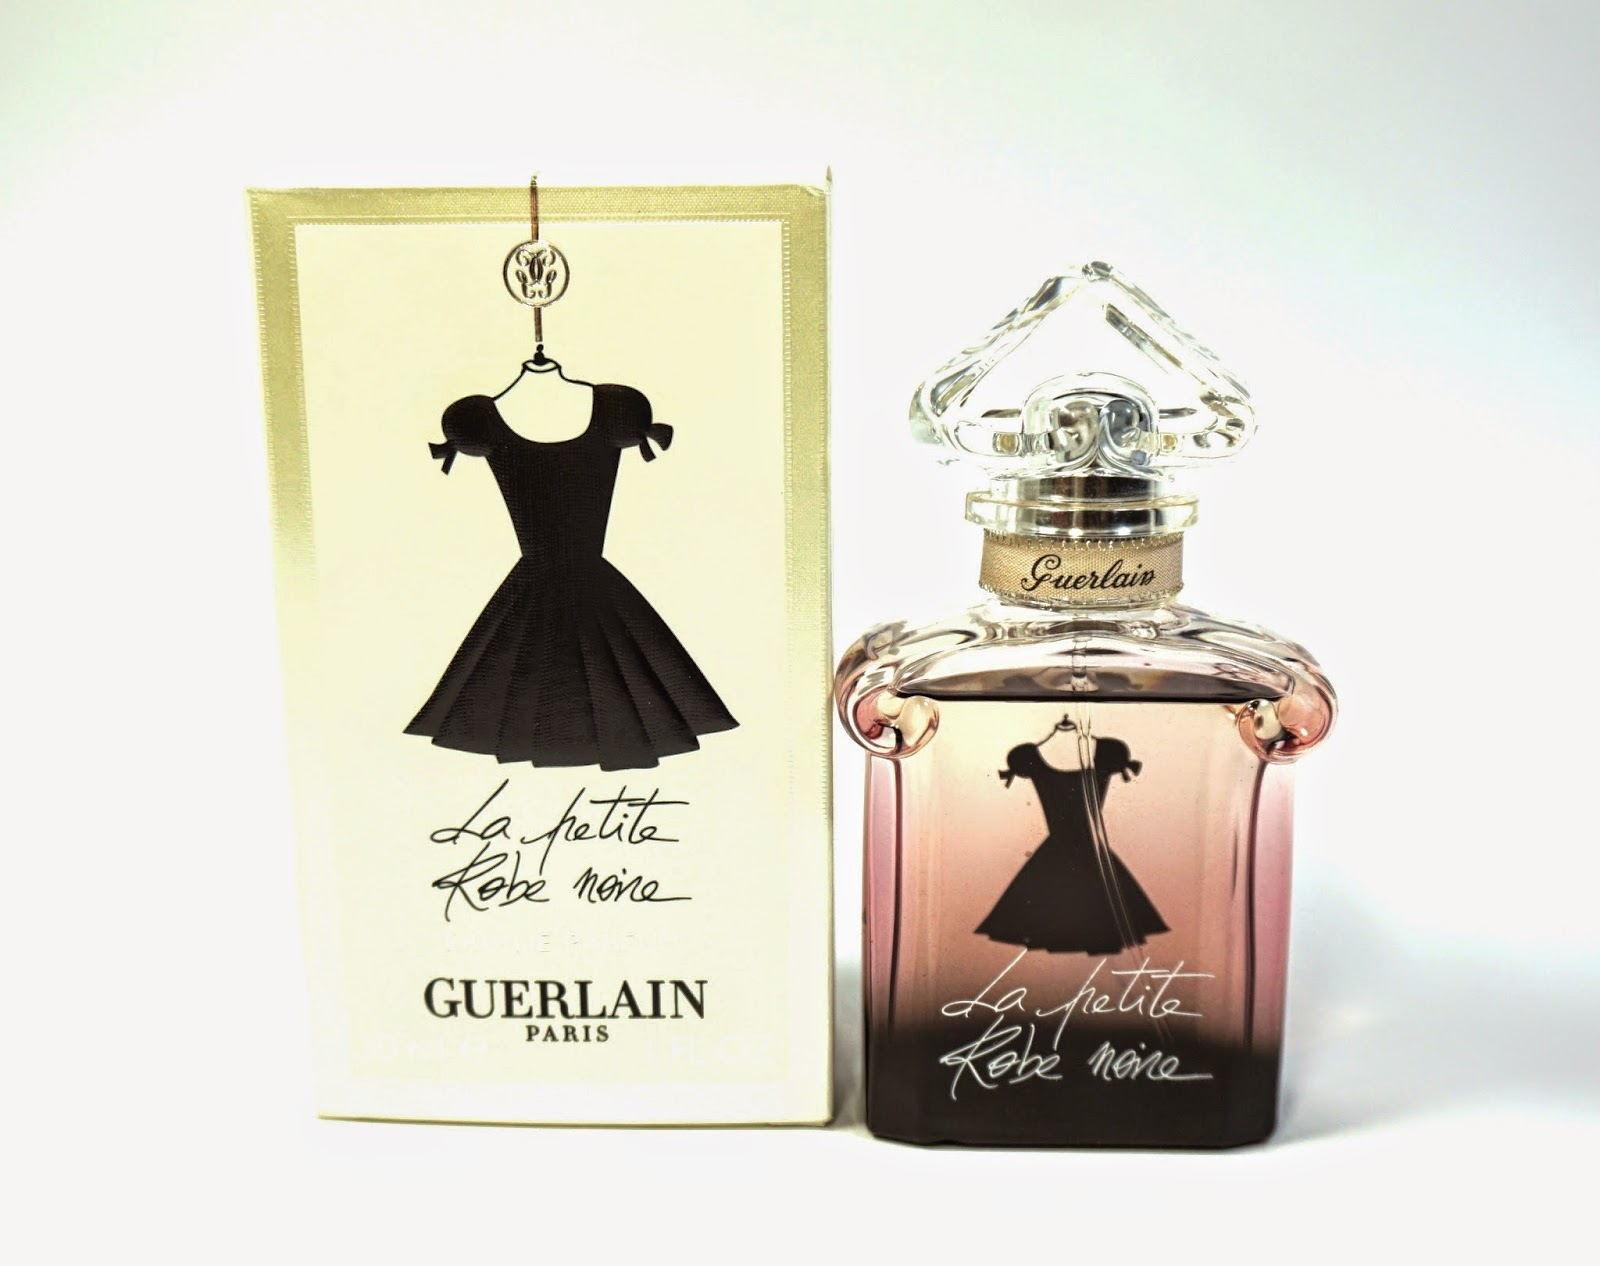 guerlain la petite robe noire edp review the beauty junkee. Black Bedroom Furniture Sets. Home Design Ideas